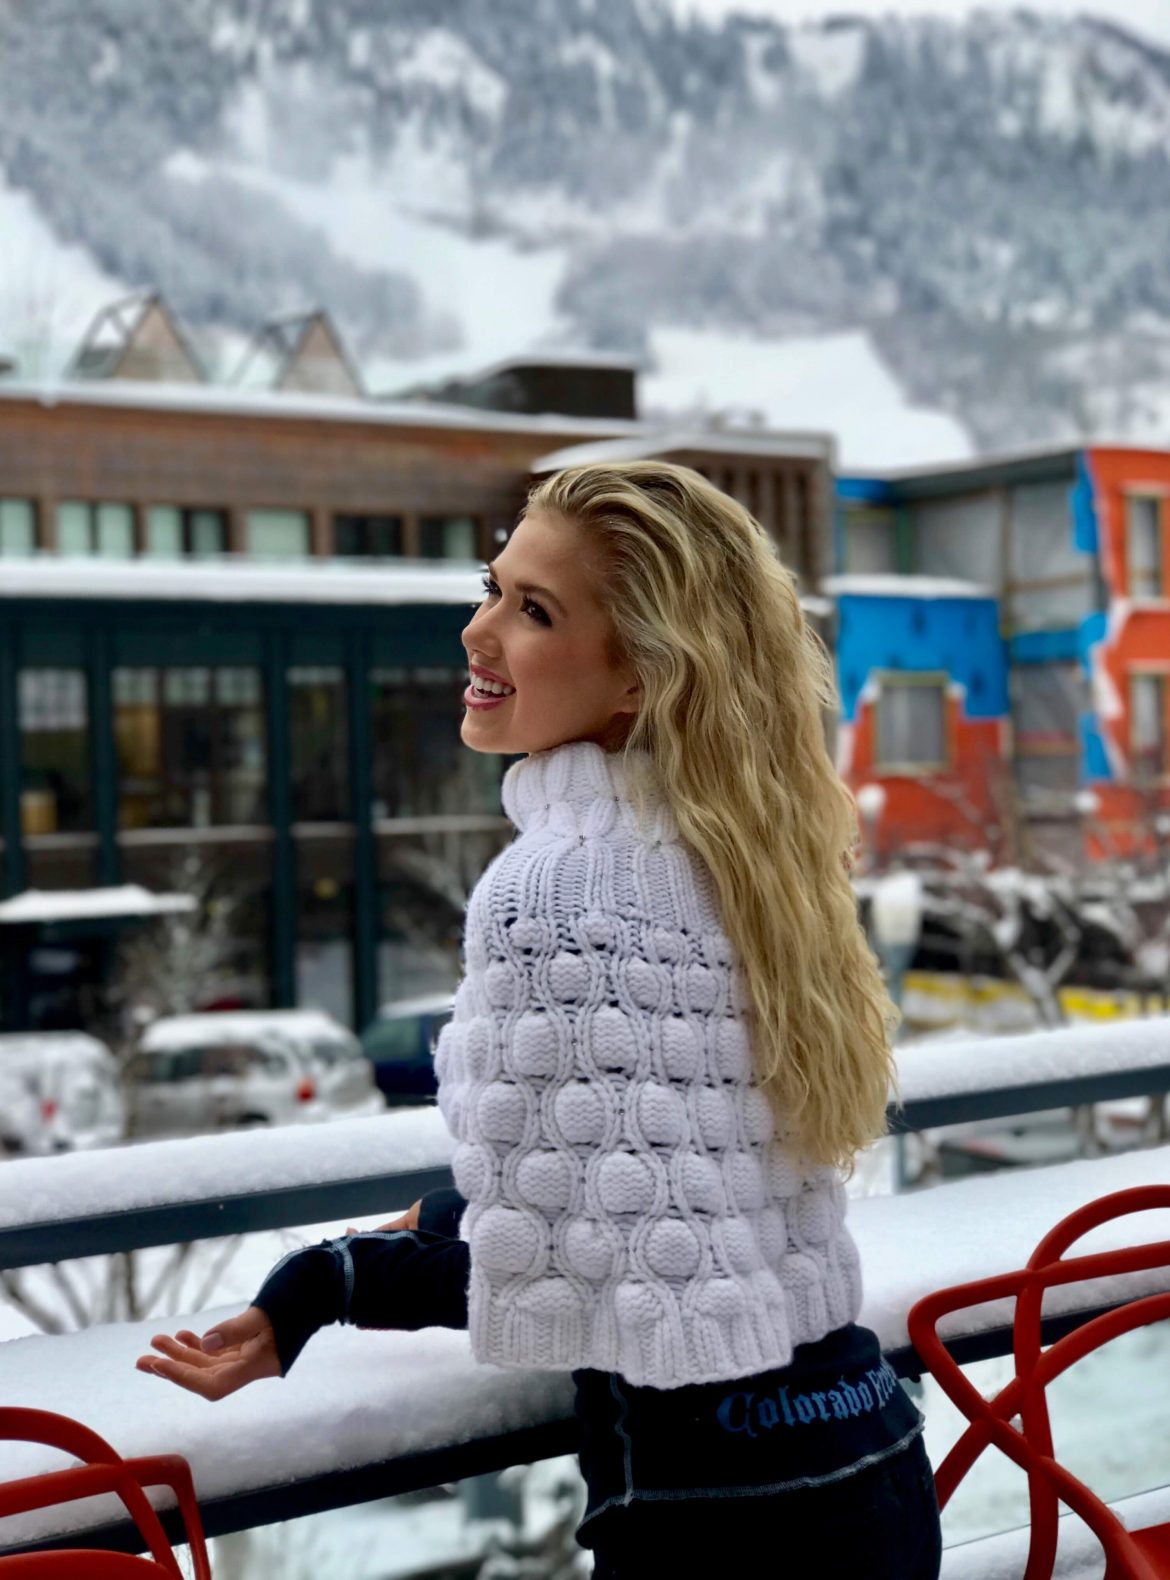 Gracie Hunt, Beautiful Girl, Winter White, Mountains, Snow